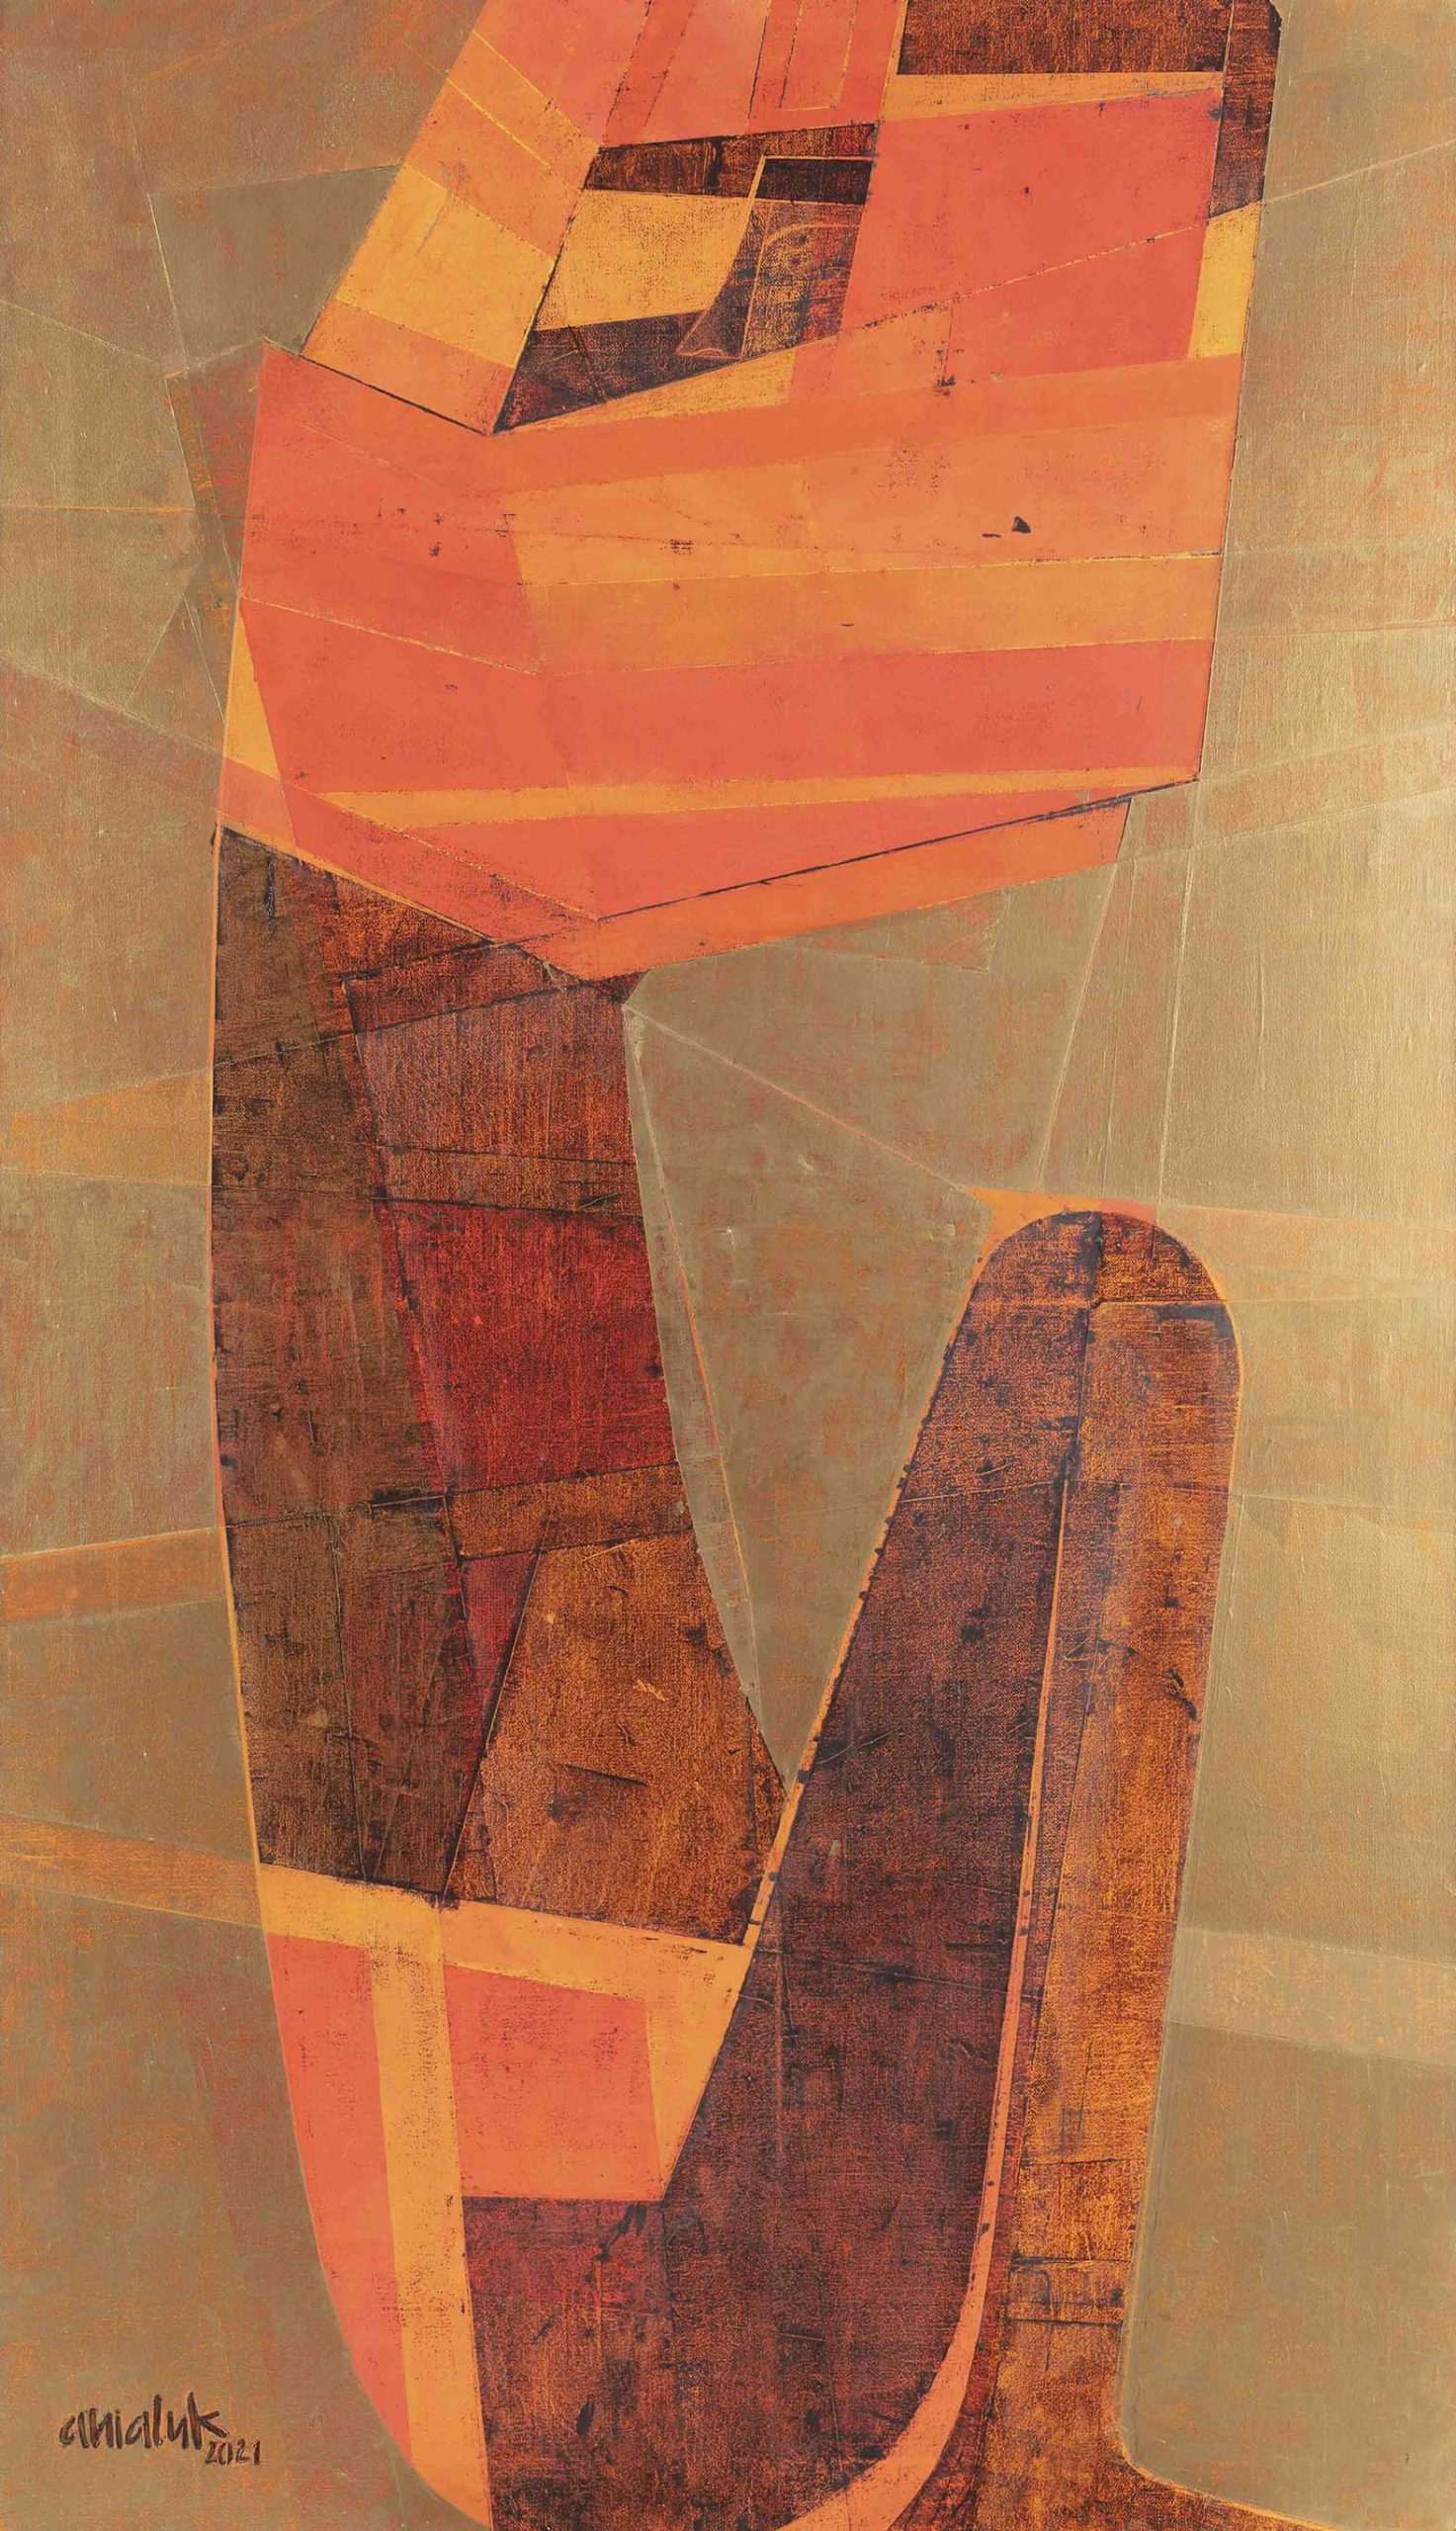 Reverse II by Ania Luk metalic